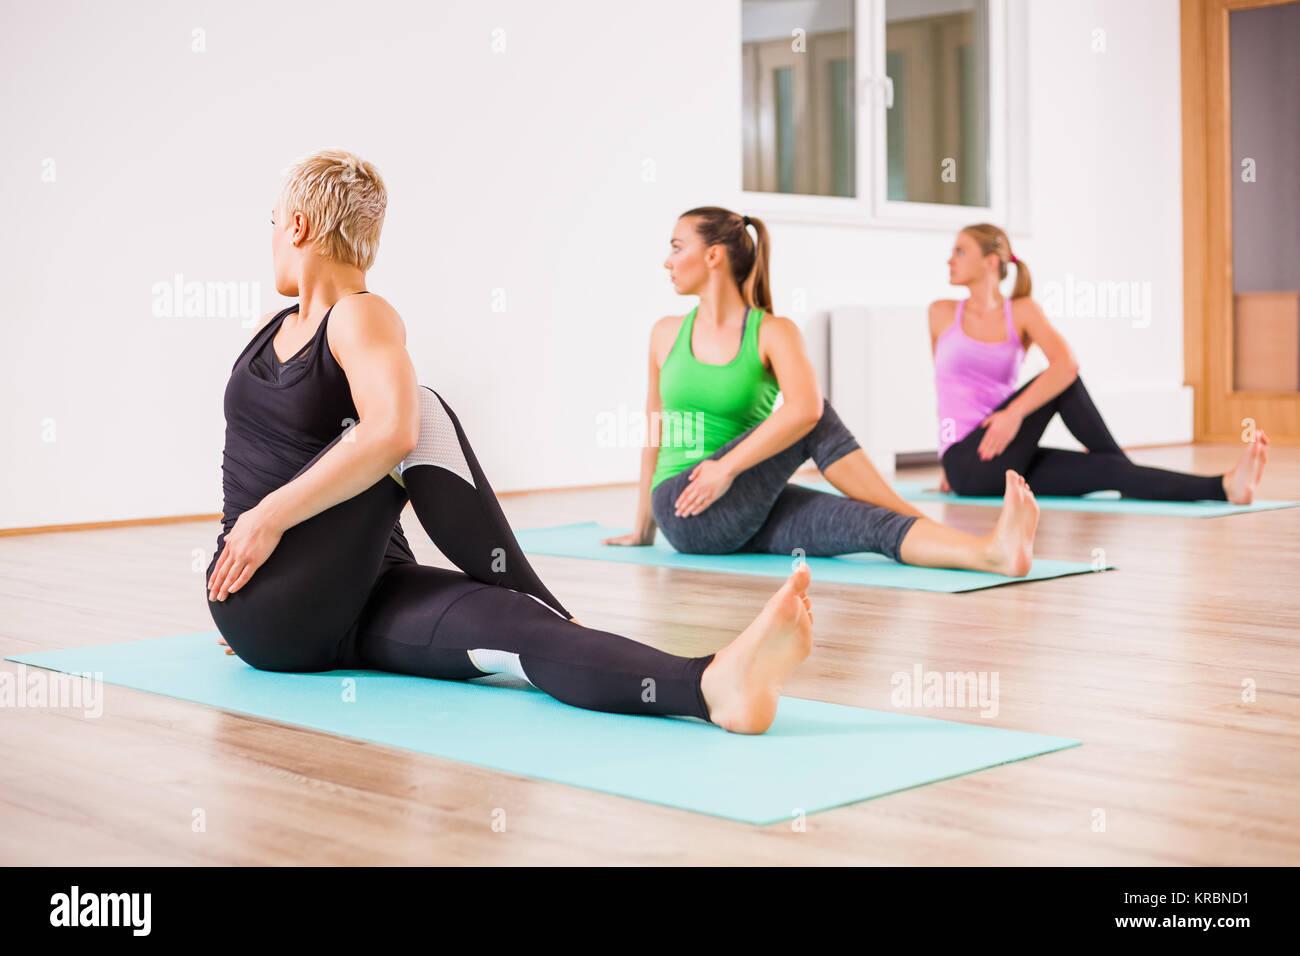 Three girls practicing yoga, Matsyendrasana / Spine-Twisting Pose - Stock Image